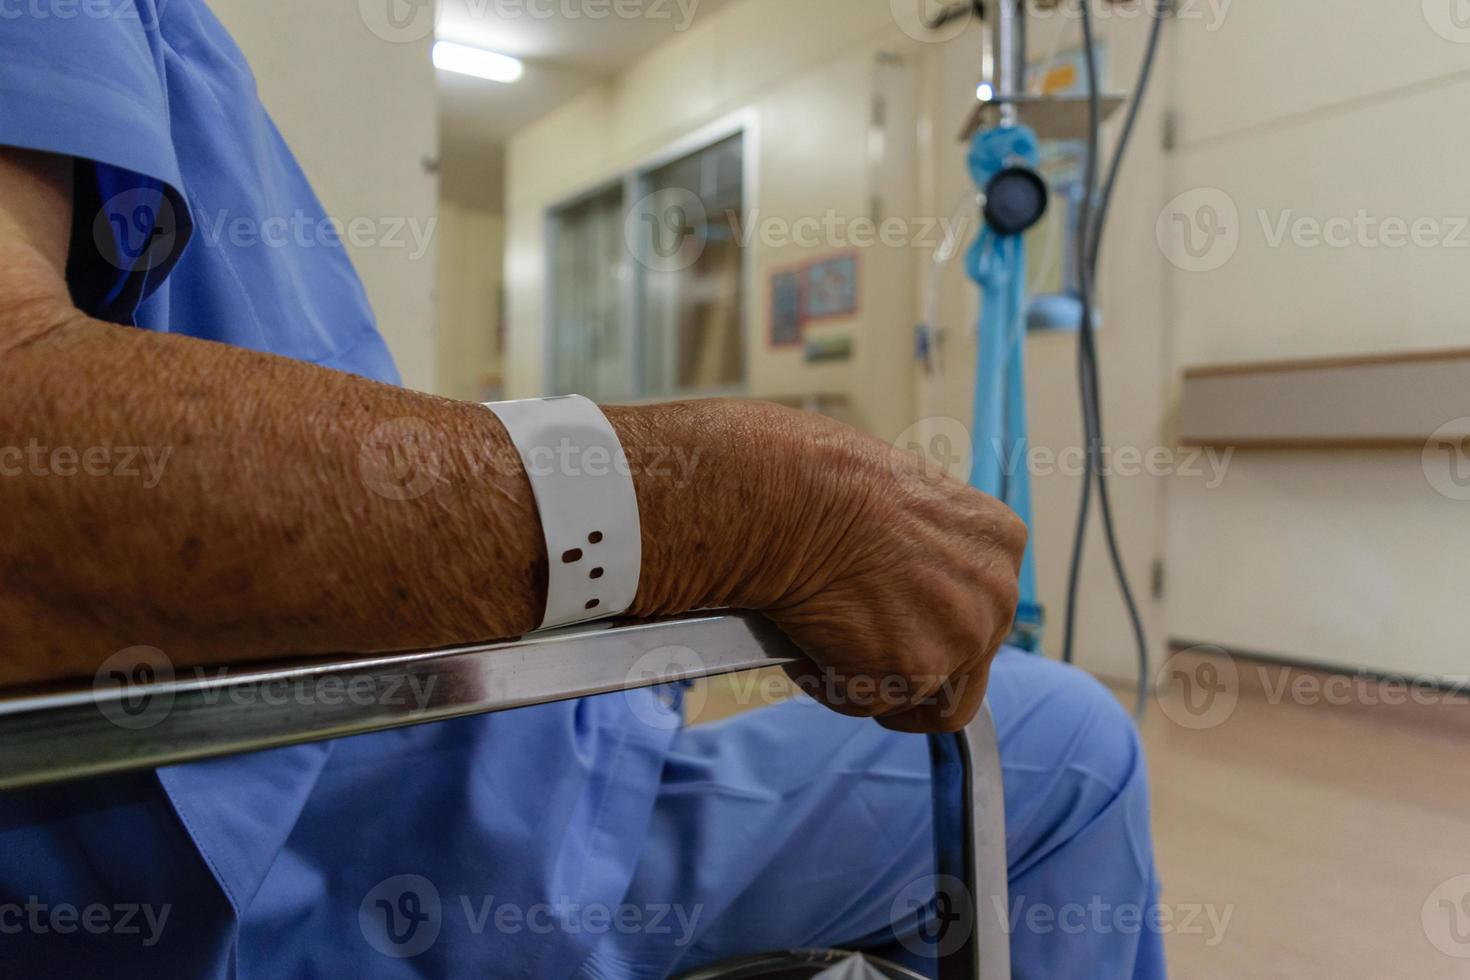 paziente in ospedale foto